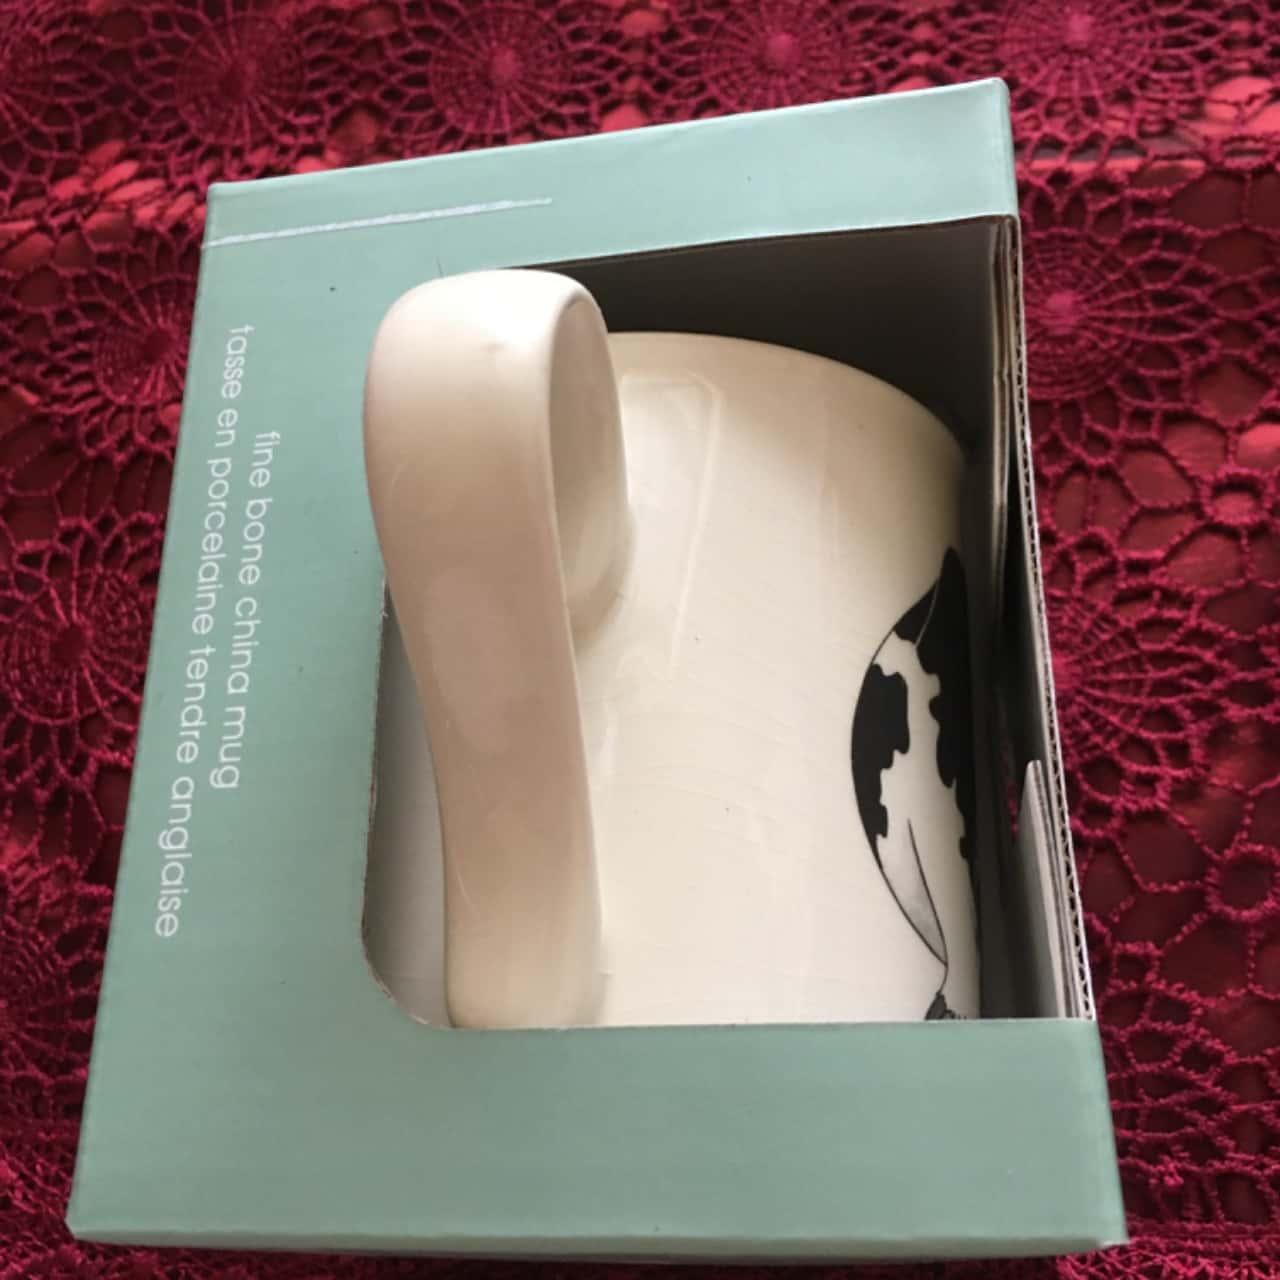 Royal Worcester Wrendale Fine Bone China Mug - Design Cow, Brand New